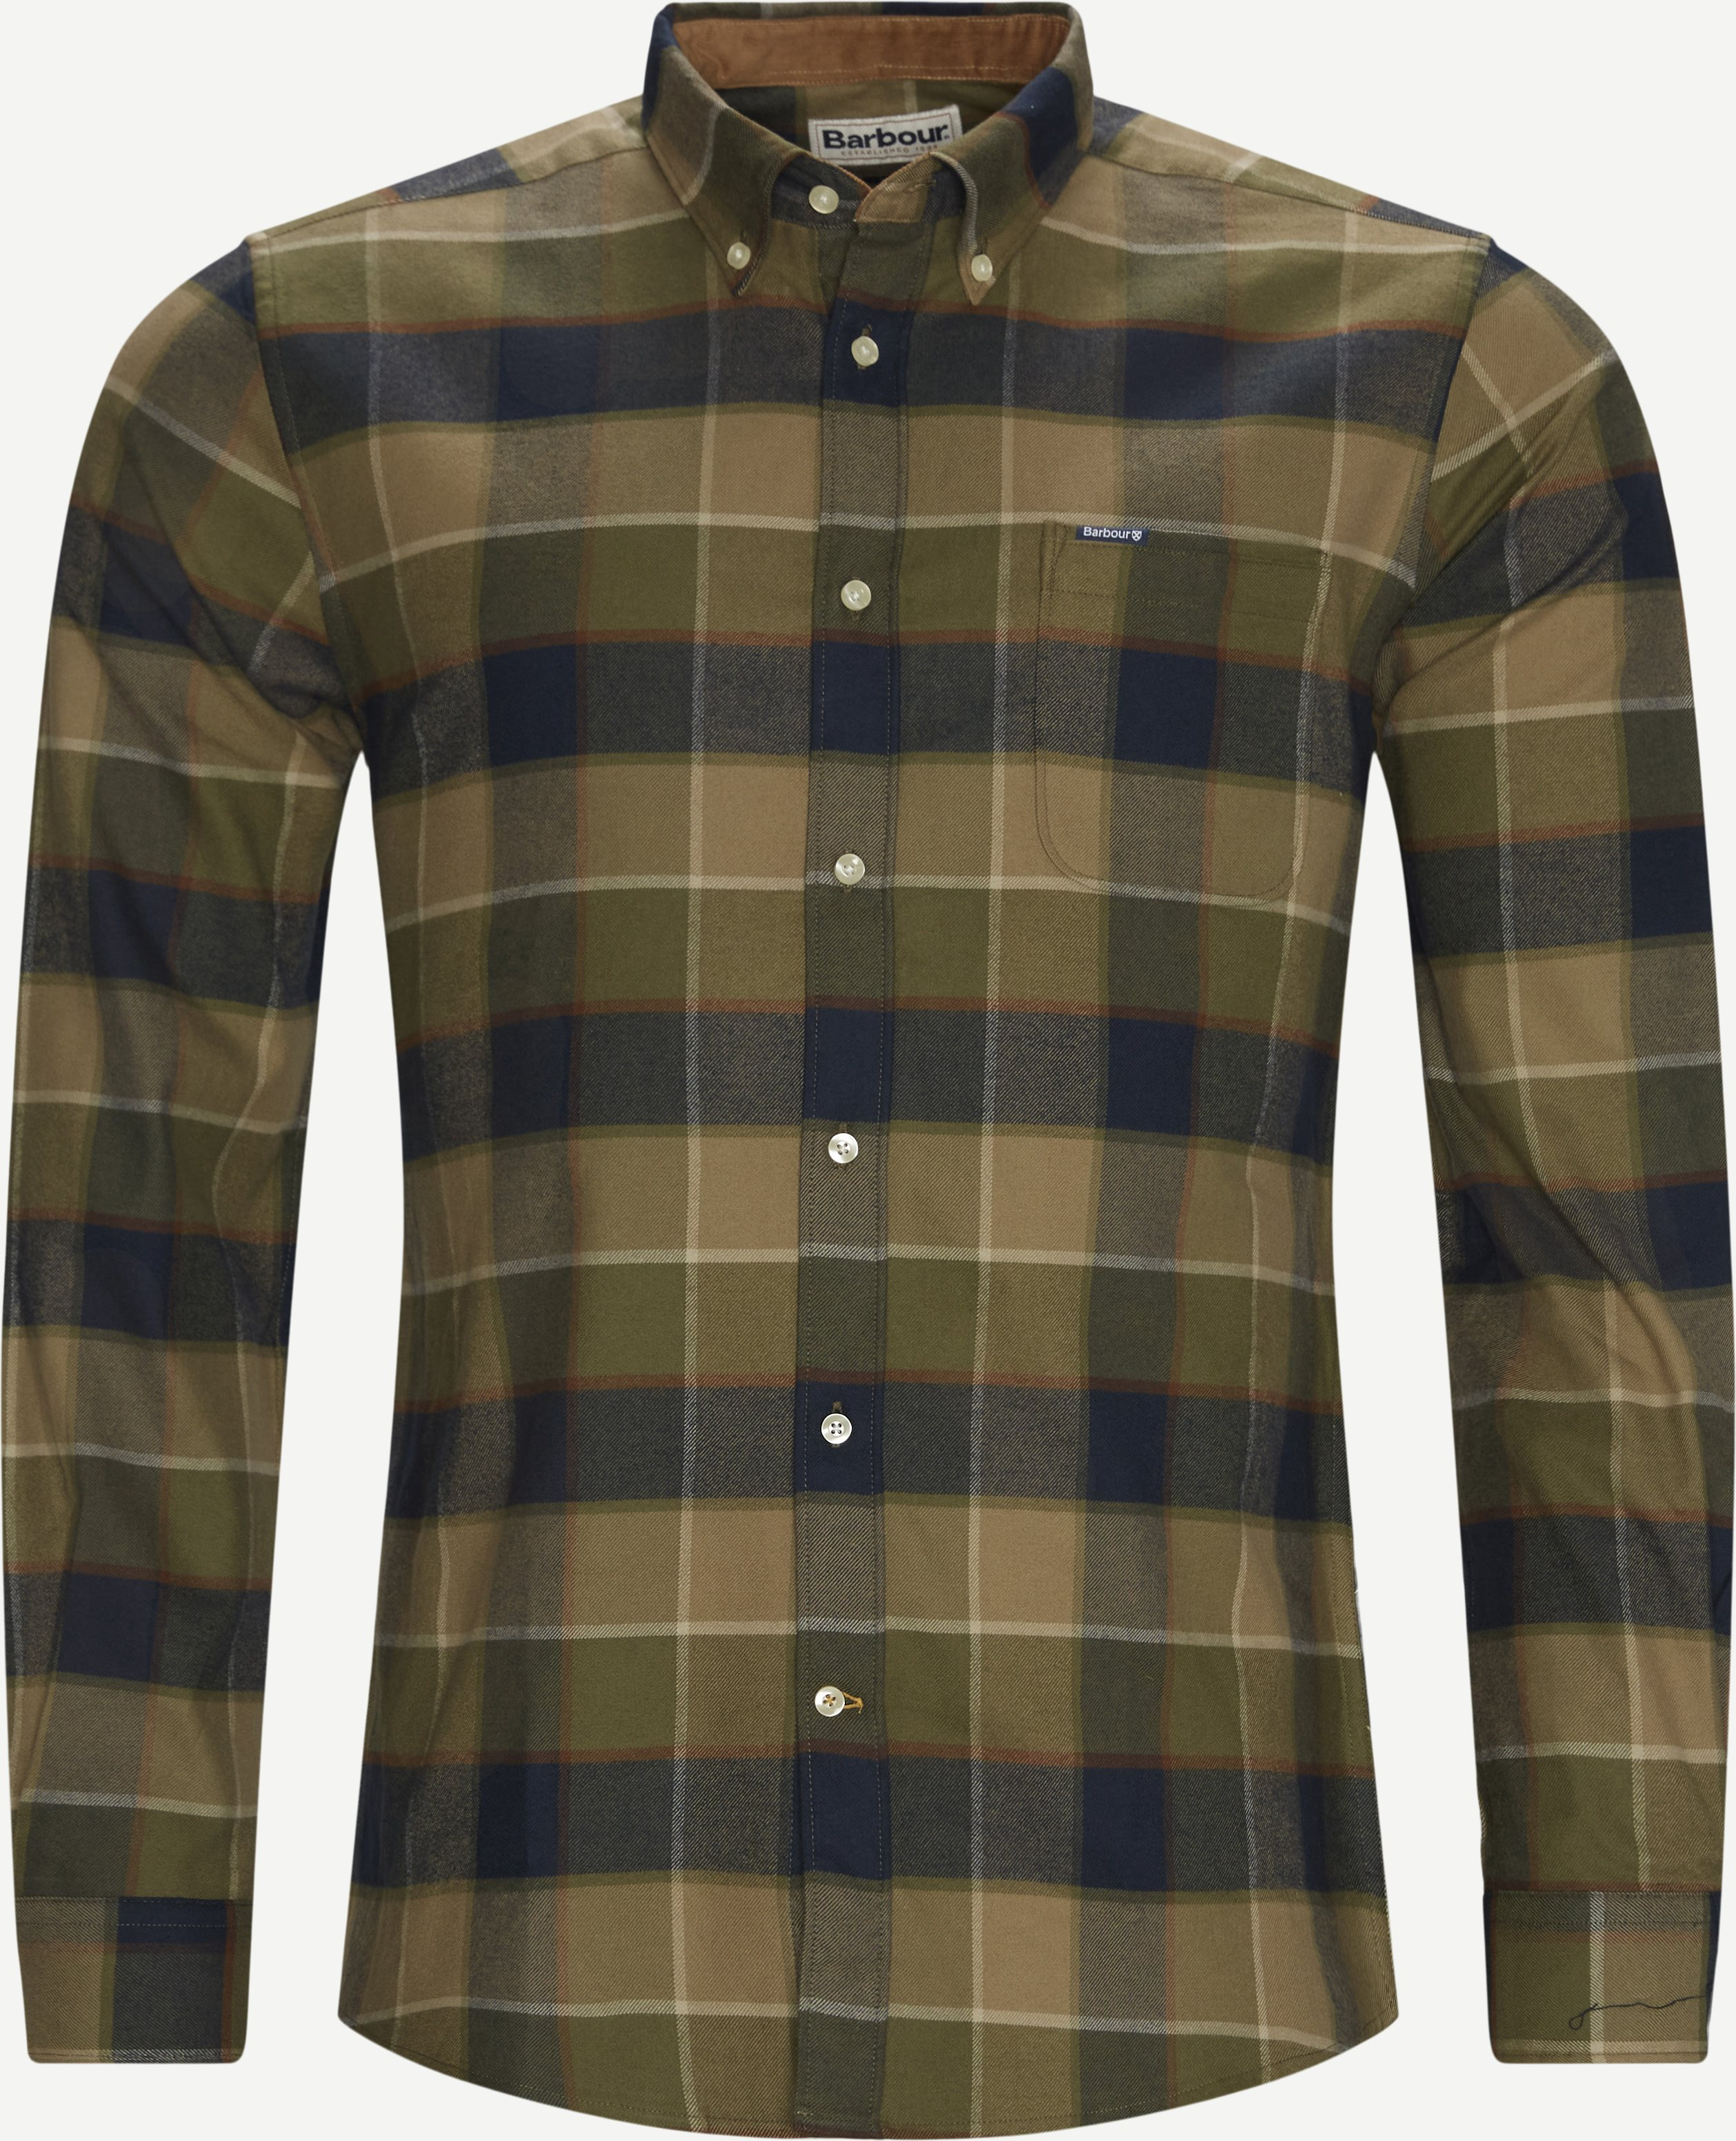 Valley Check Skjorte - Skjorter - Tailored fit - Army